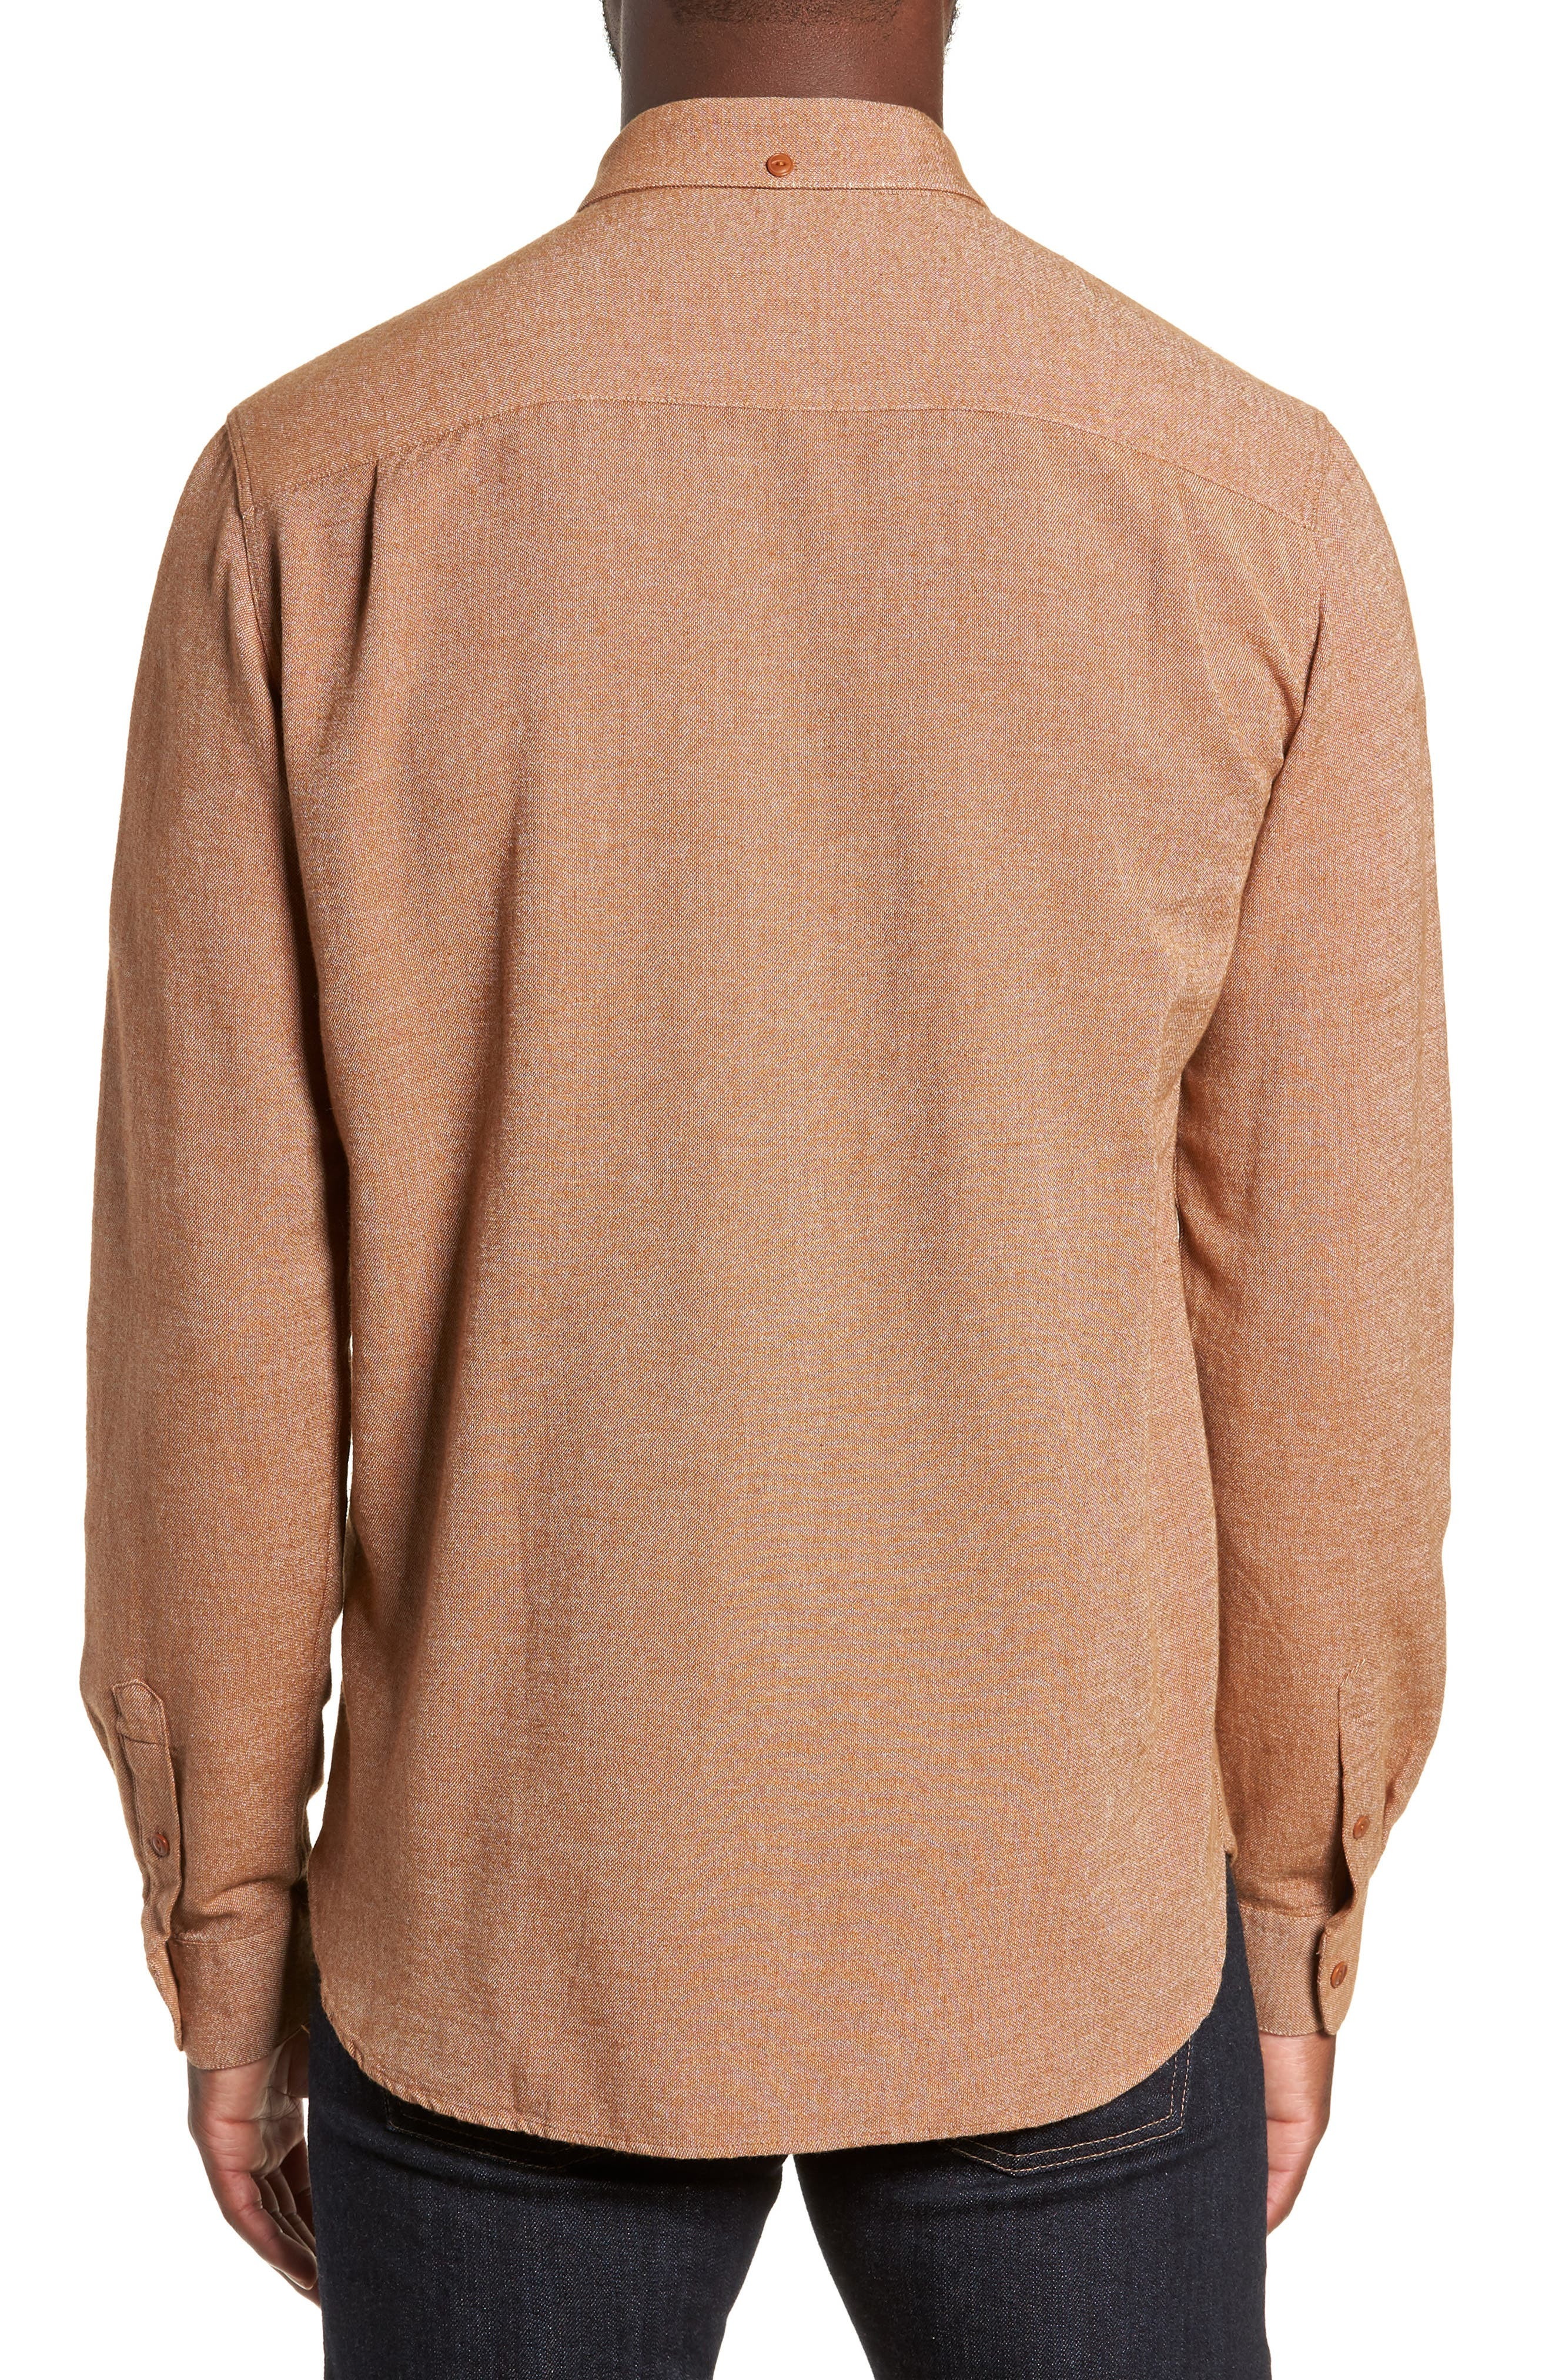 Dean Regular Fit Chambray Shirt,                             Alternate thumbnail 3, color,                             200